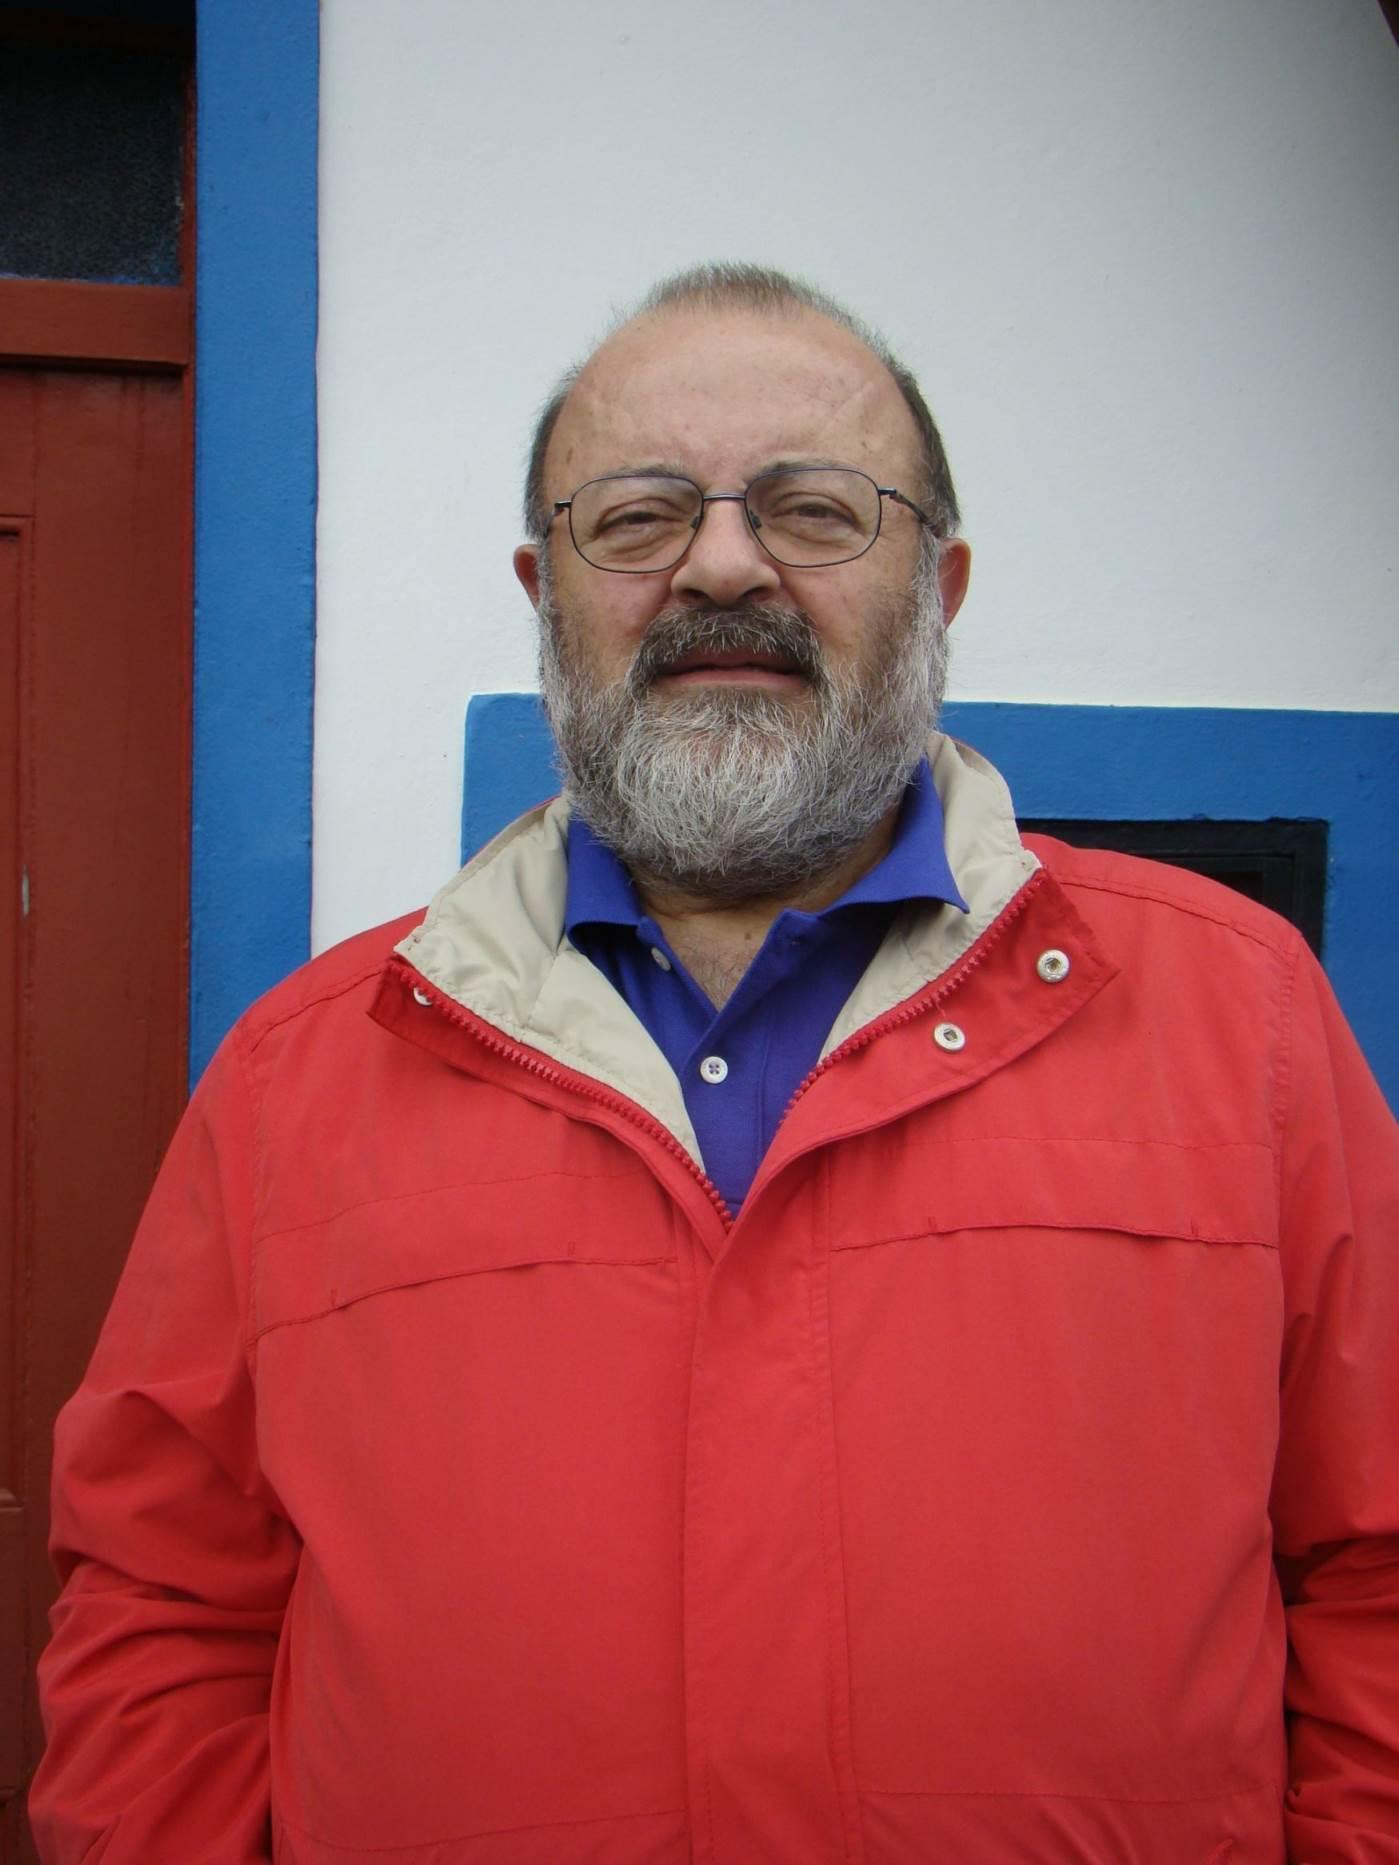 José Viale Moutinho